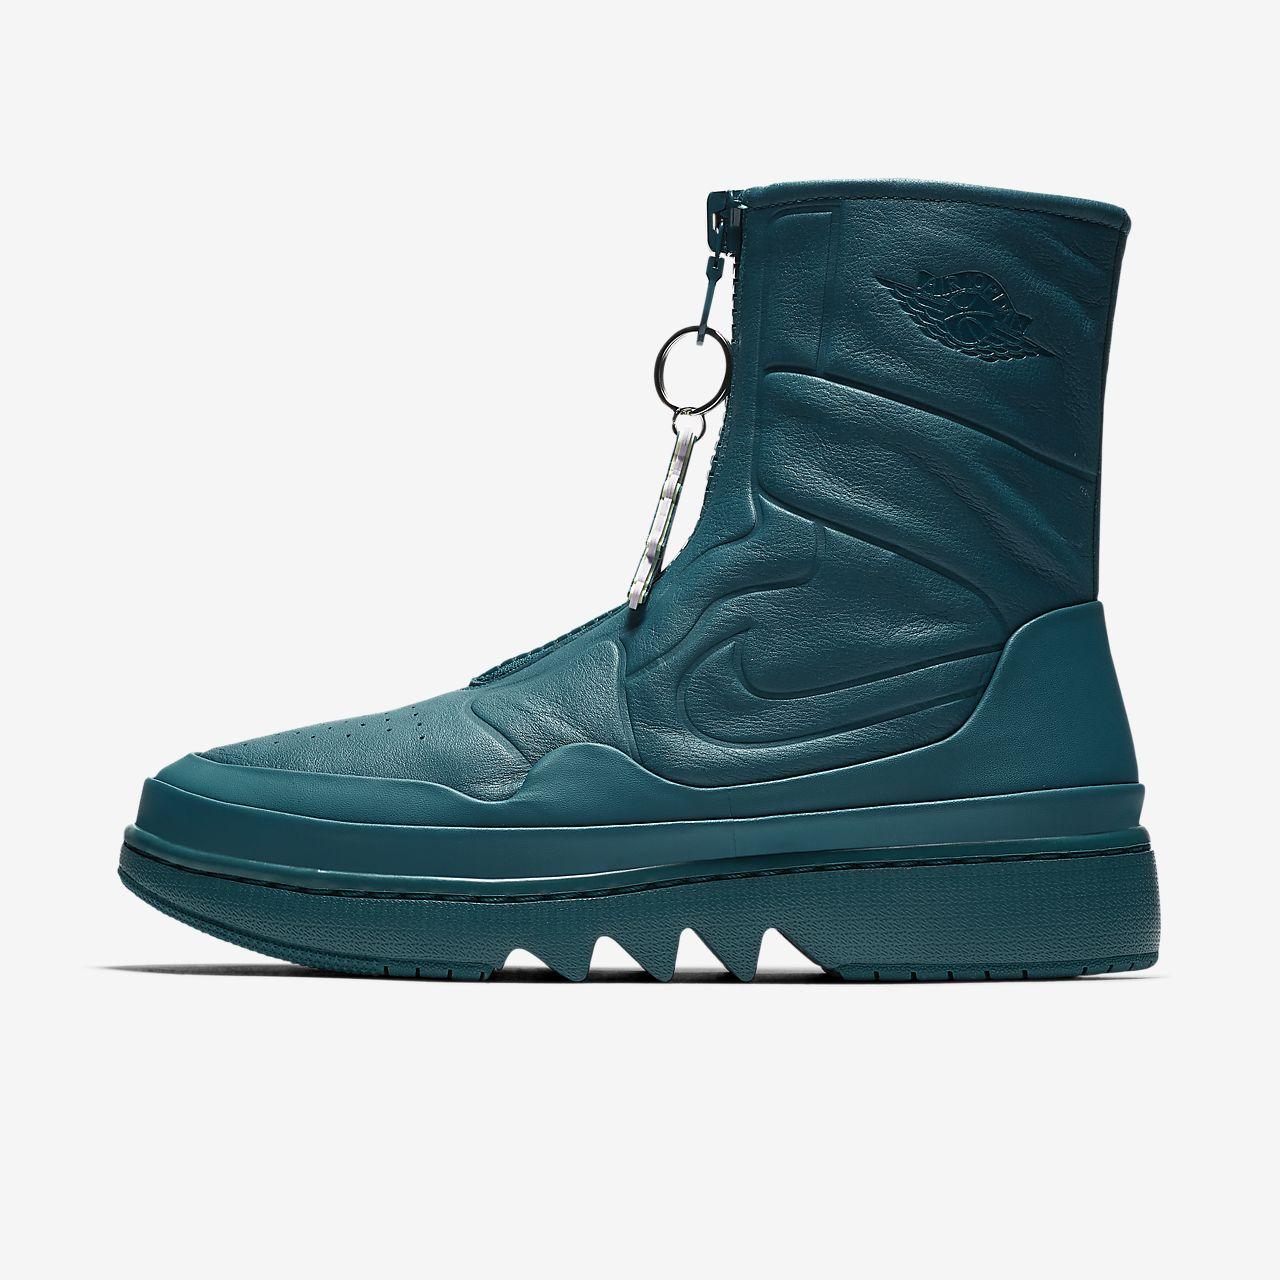 281631da5cec Jordan AJ1 Jester XX Women s Shoe. Nike.com GB